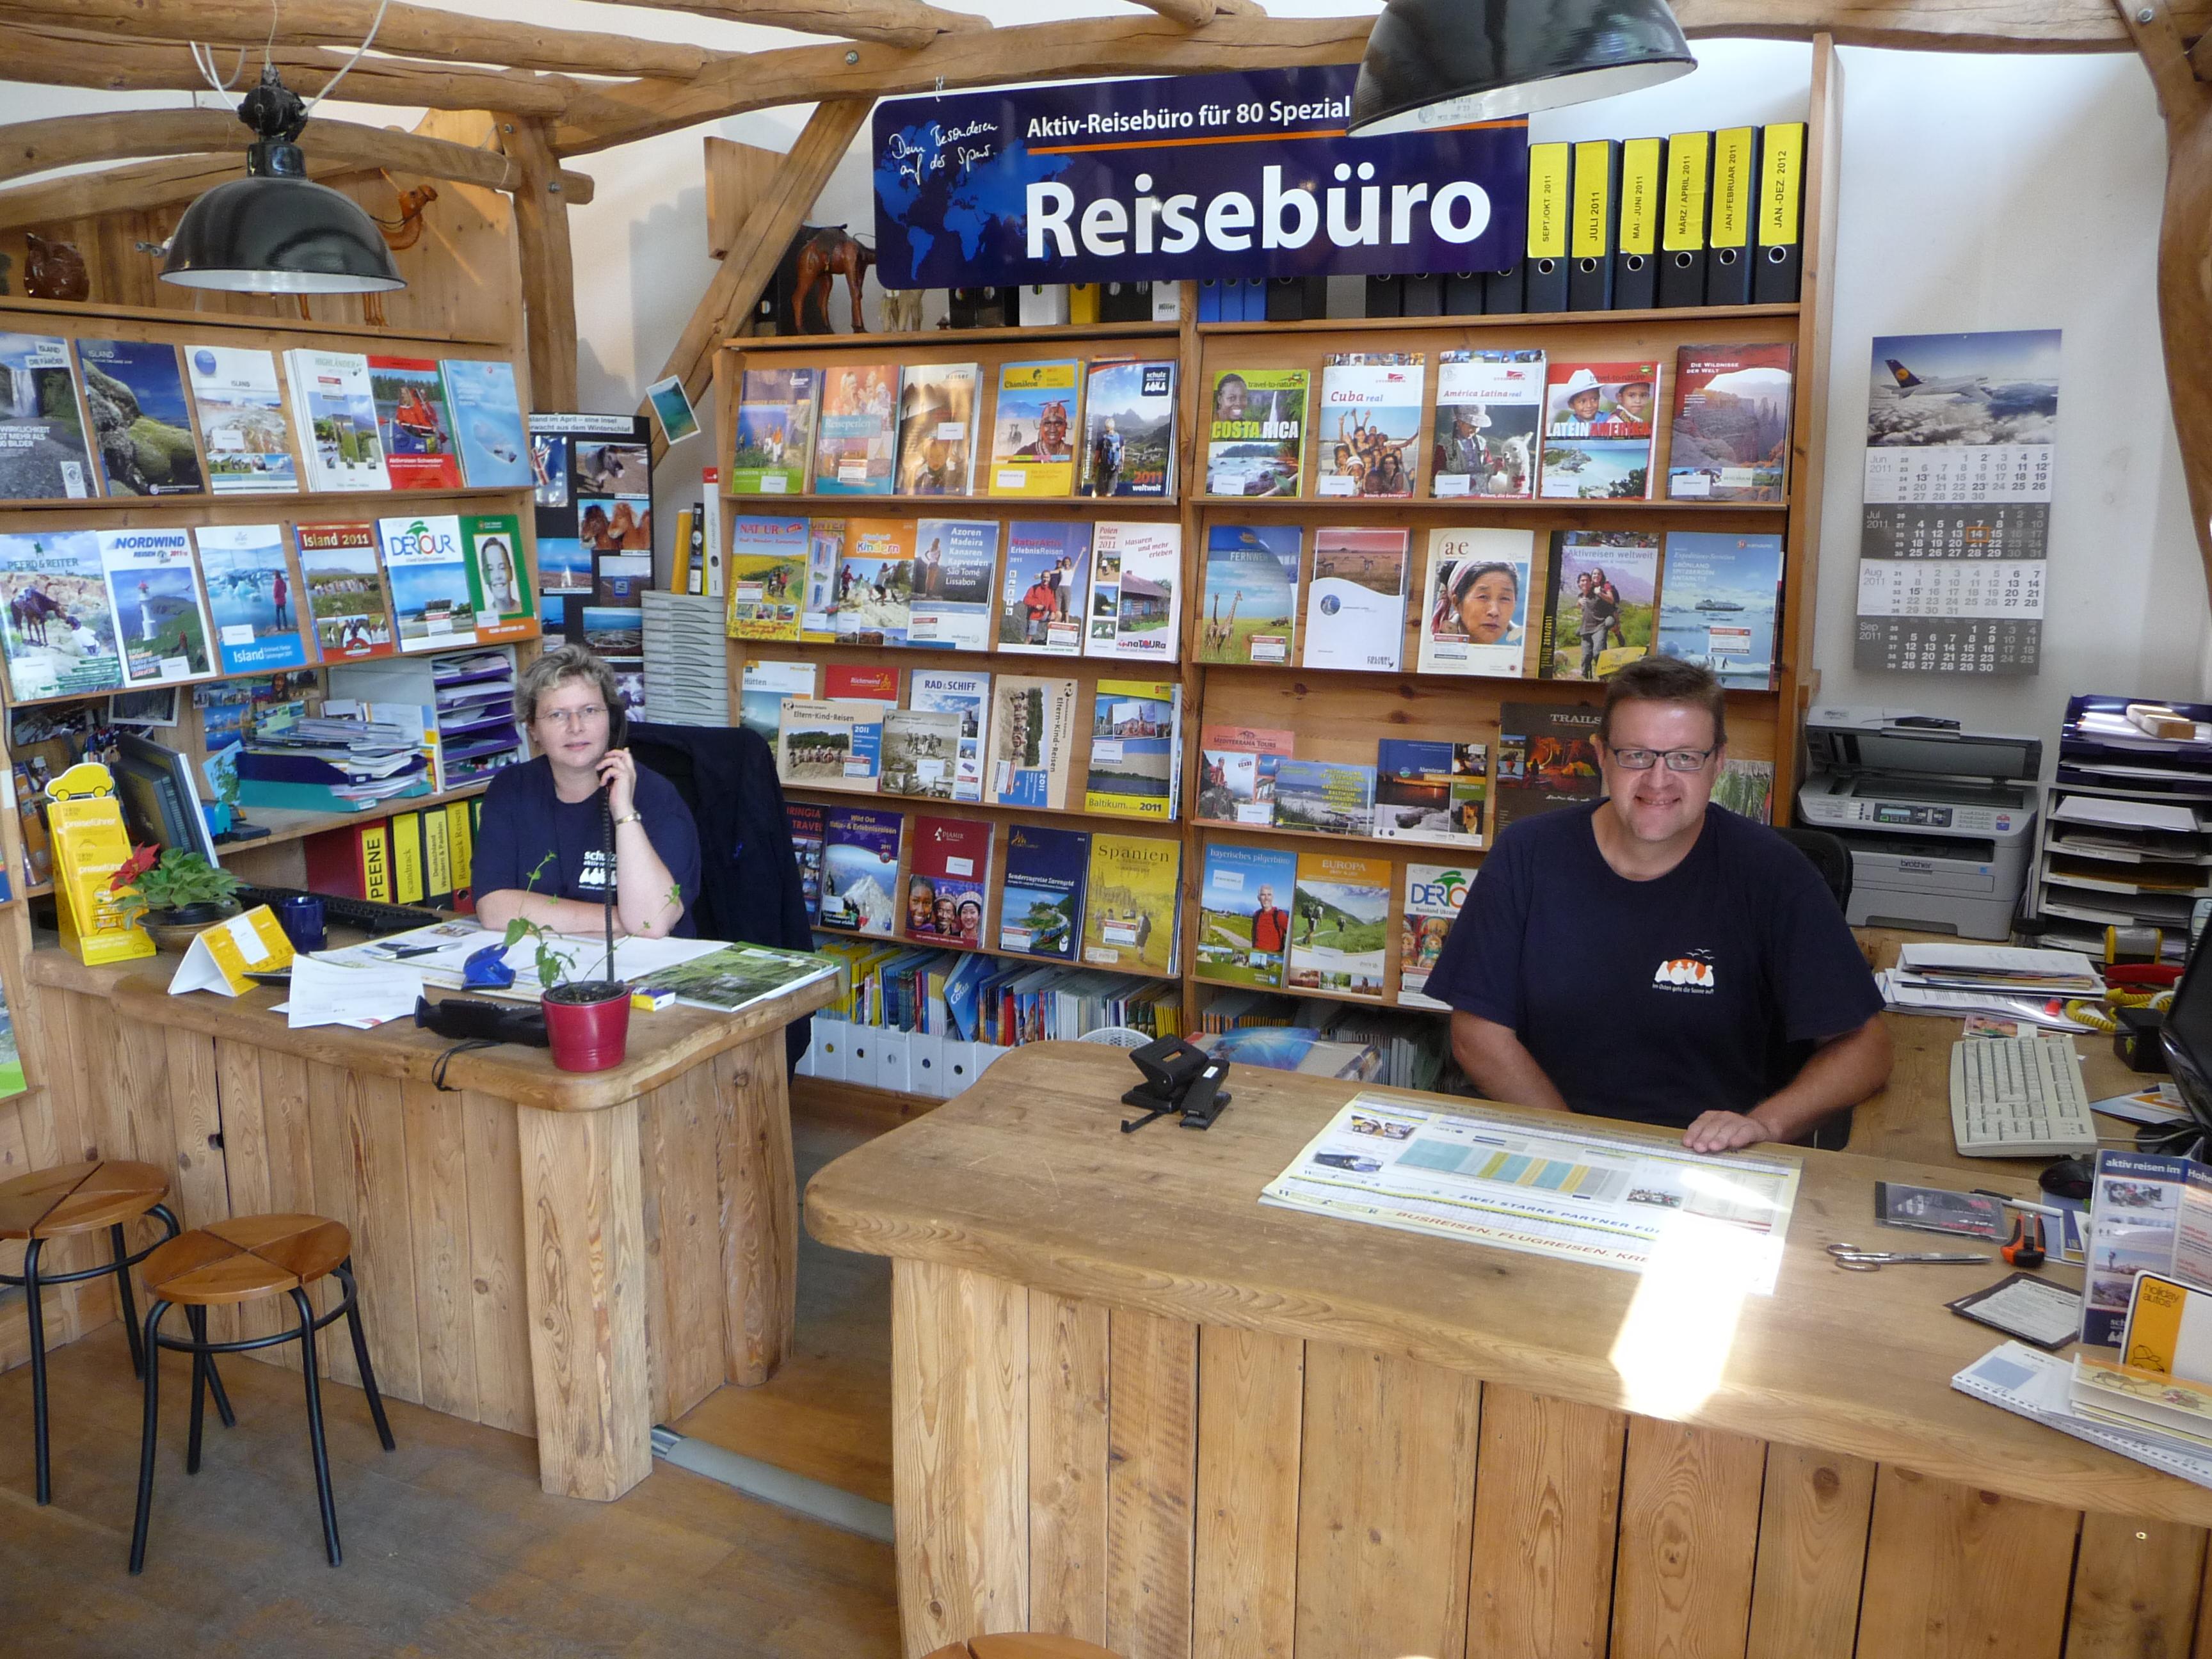 Reisebüro schulz aktiv reisen - schulz aktiv reisen